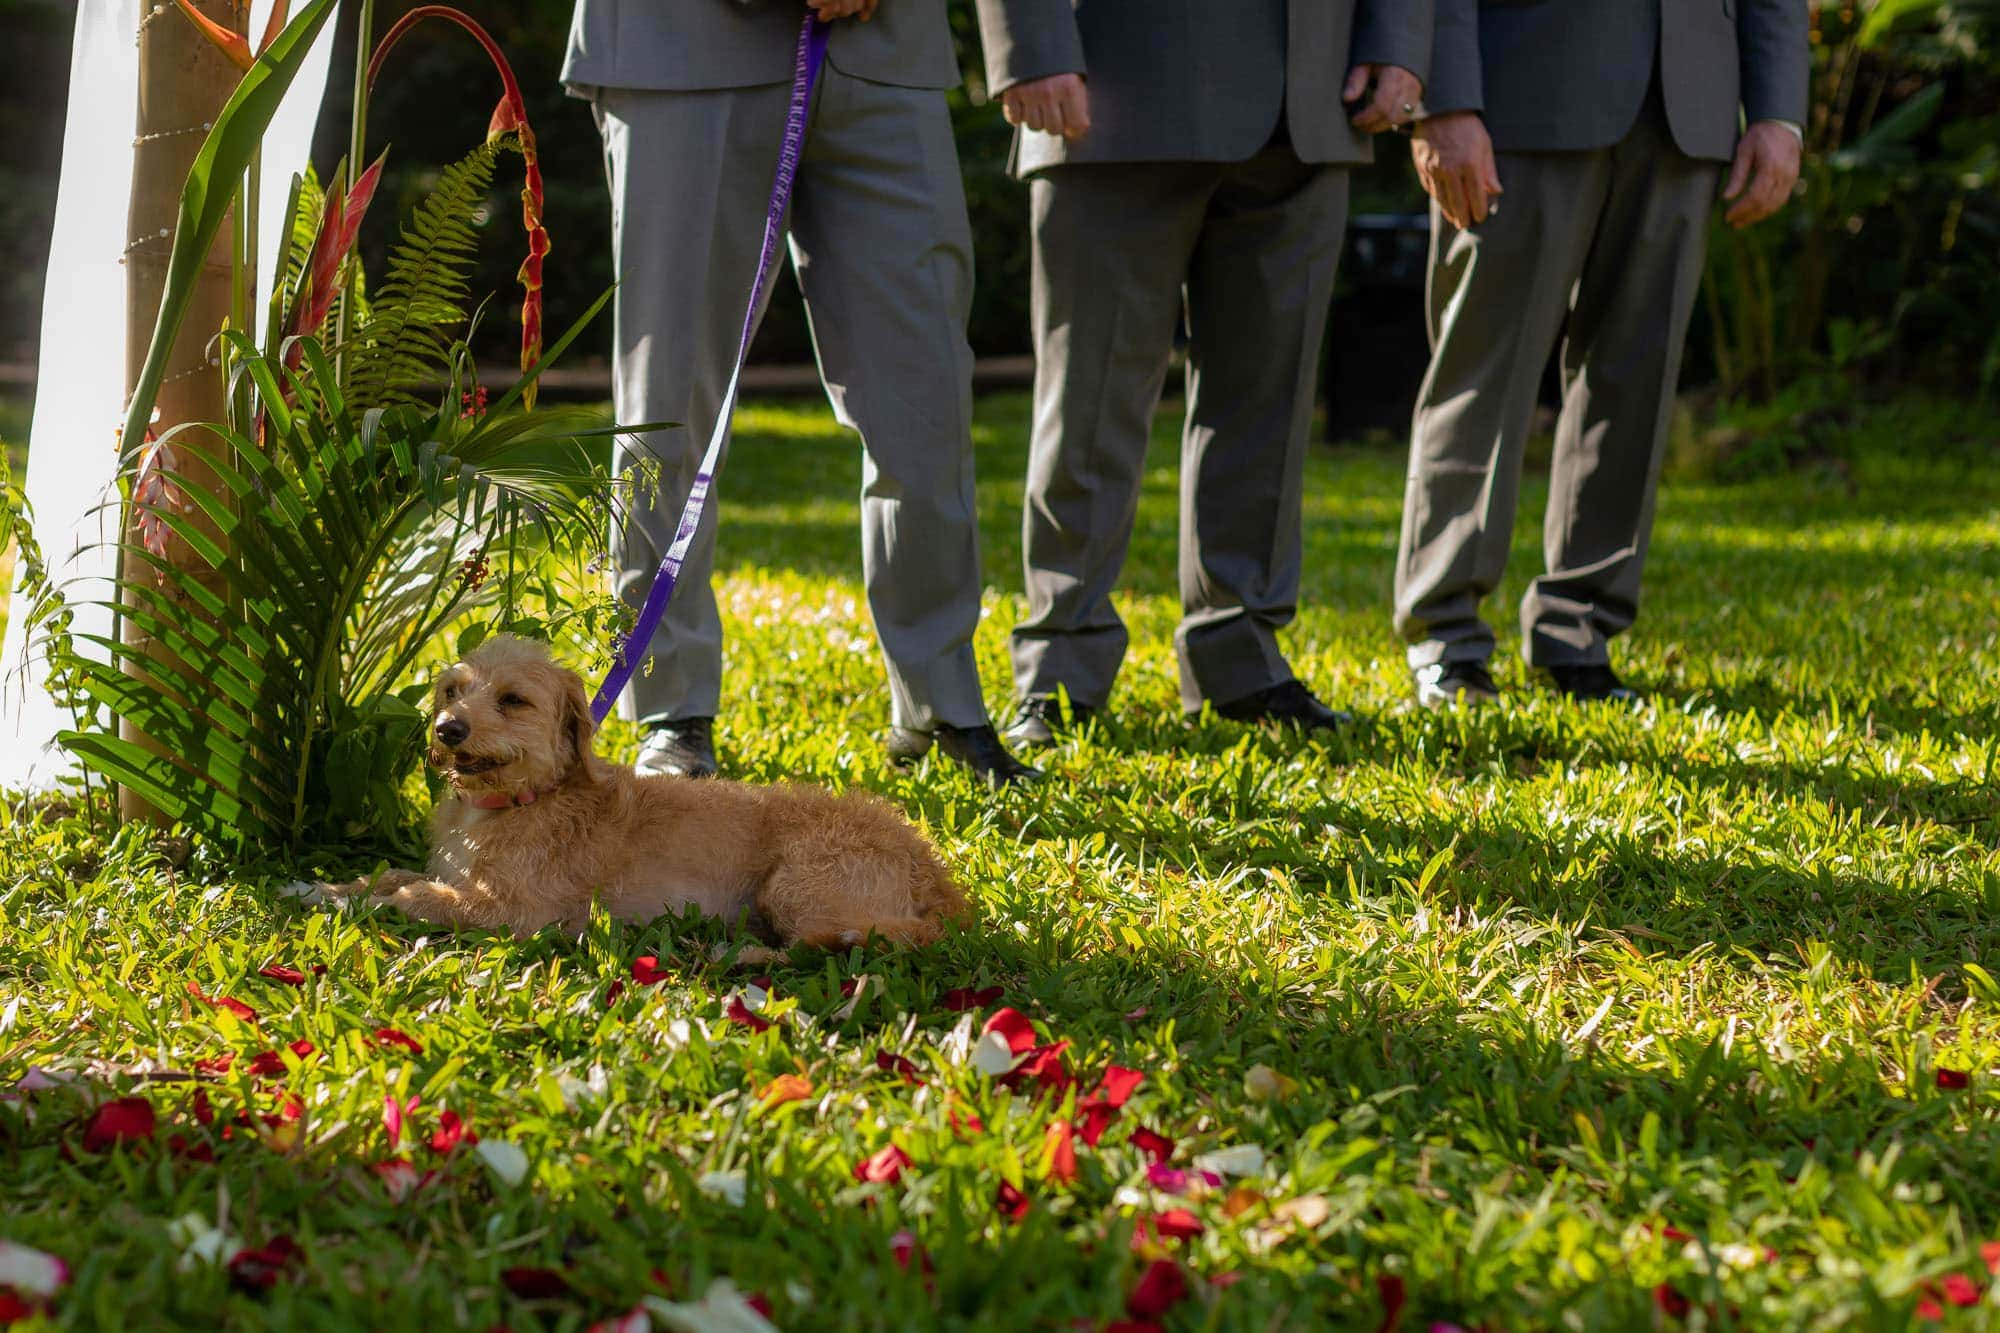 A little furry guest (dog joins the festivities)